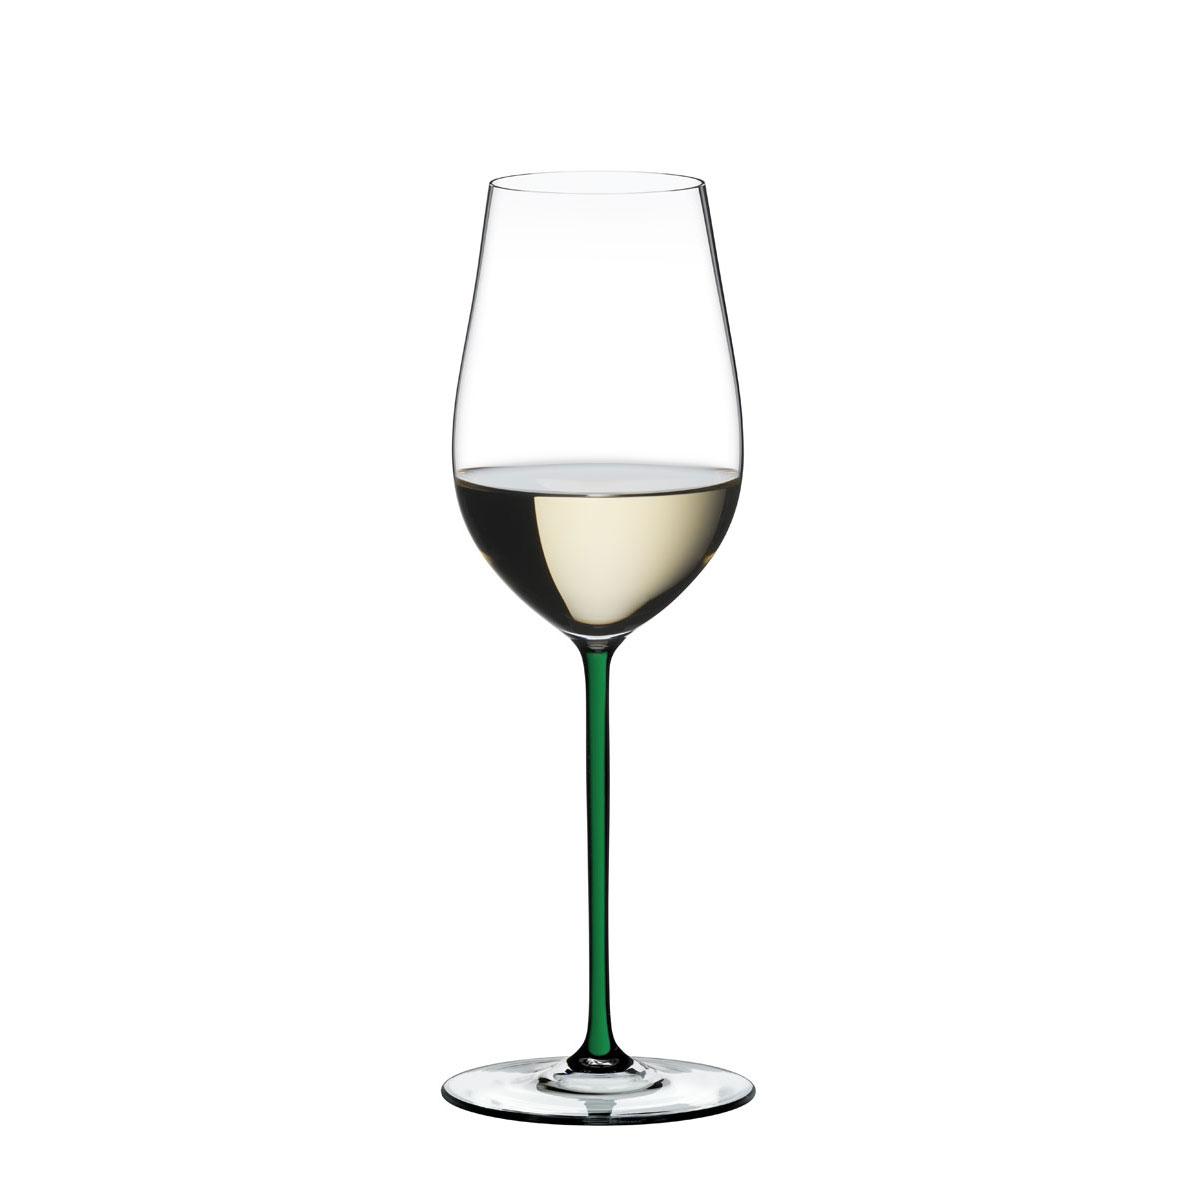 Riedel Fatto A Mano, Riesling, Zinfandel Wine Glass, Green